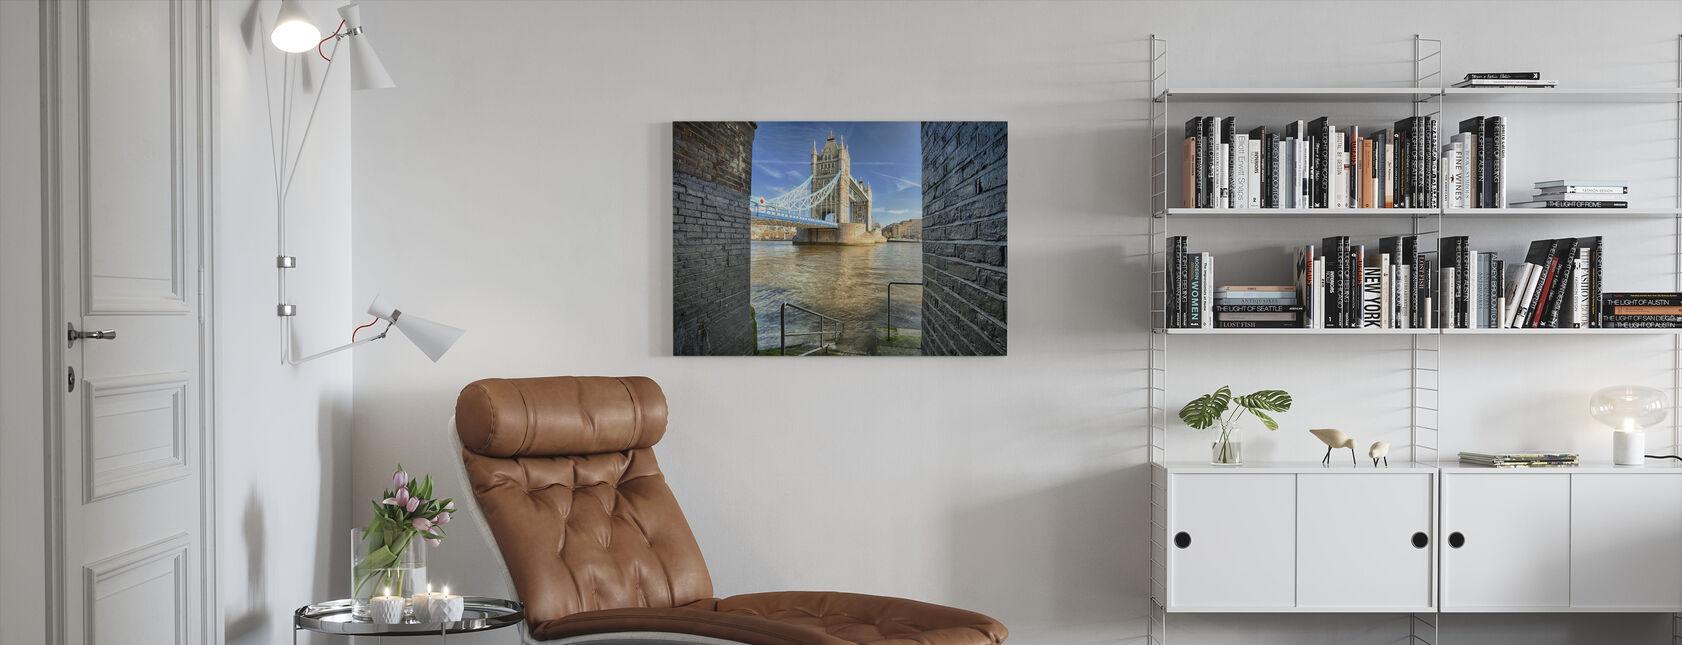 Alternative View on Tower Bridge - Canvas print - Living Room